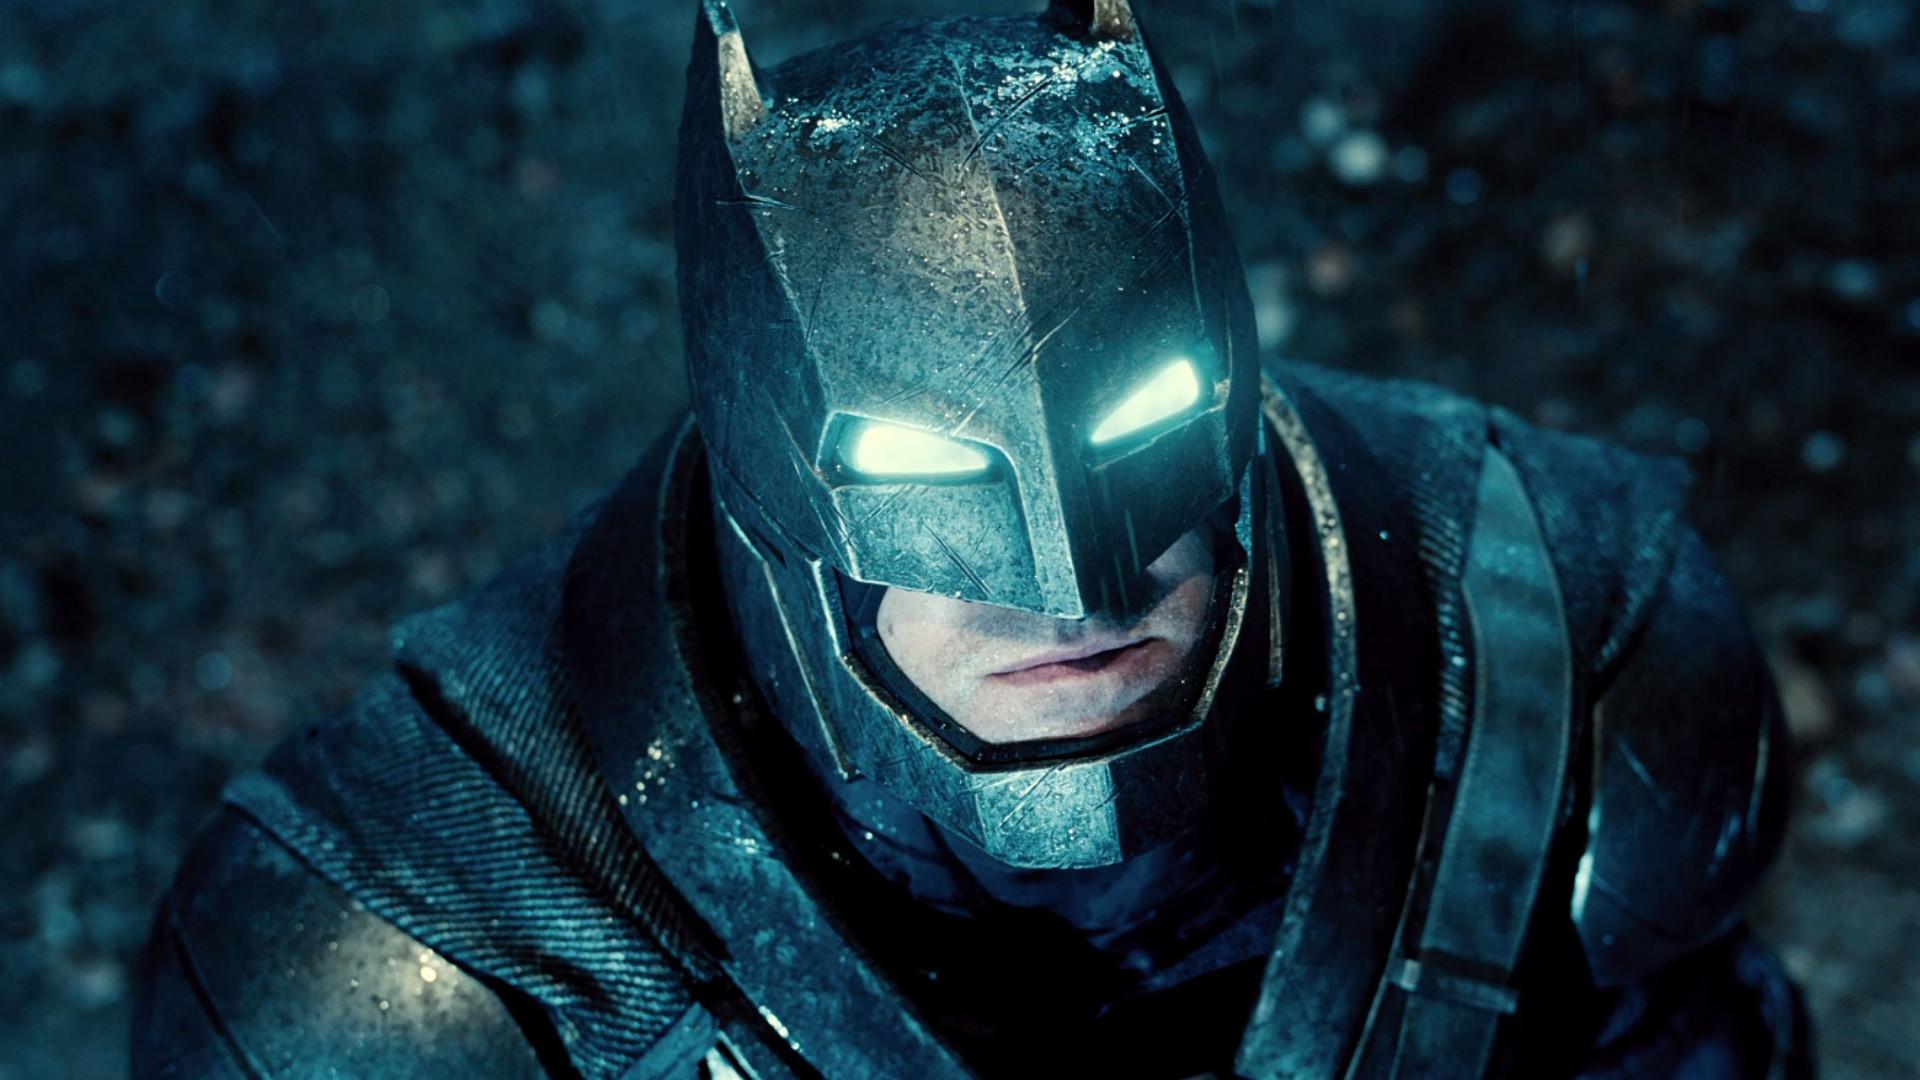 Batman Metal Armour in Batman v Superman: Dawn of Justice Wallpaper